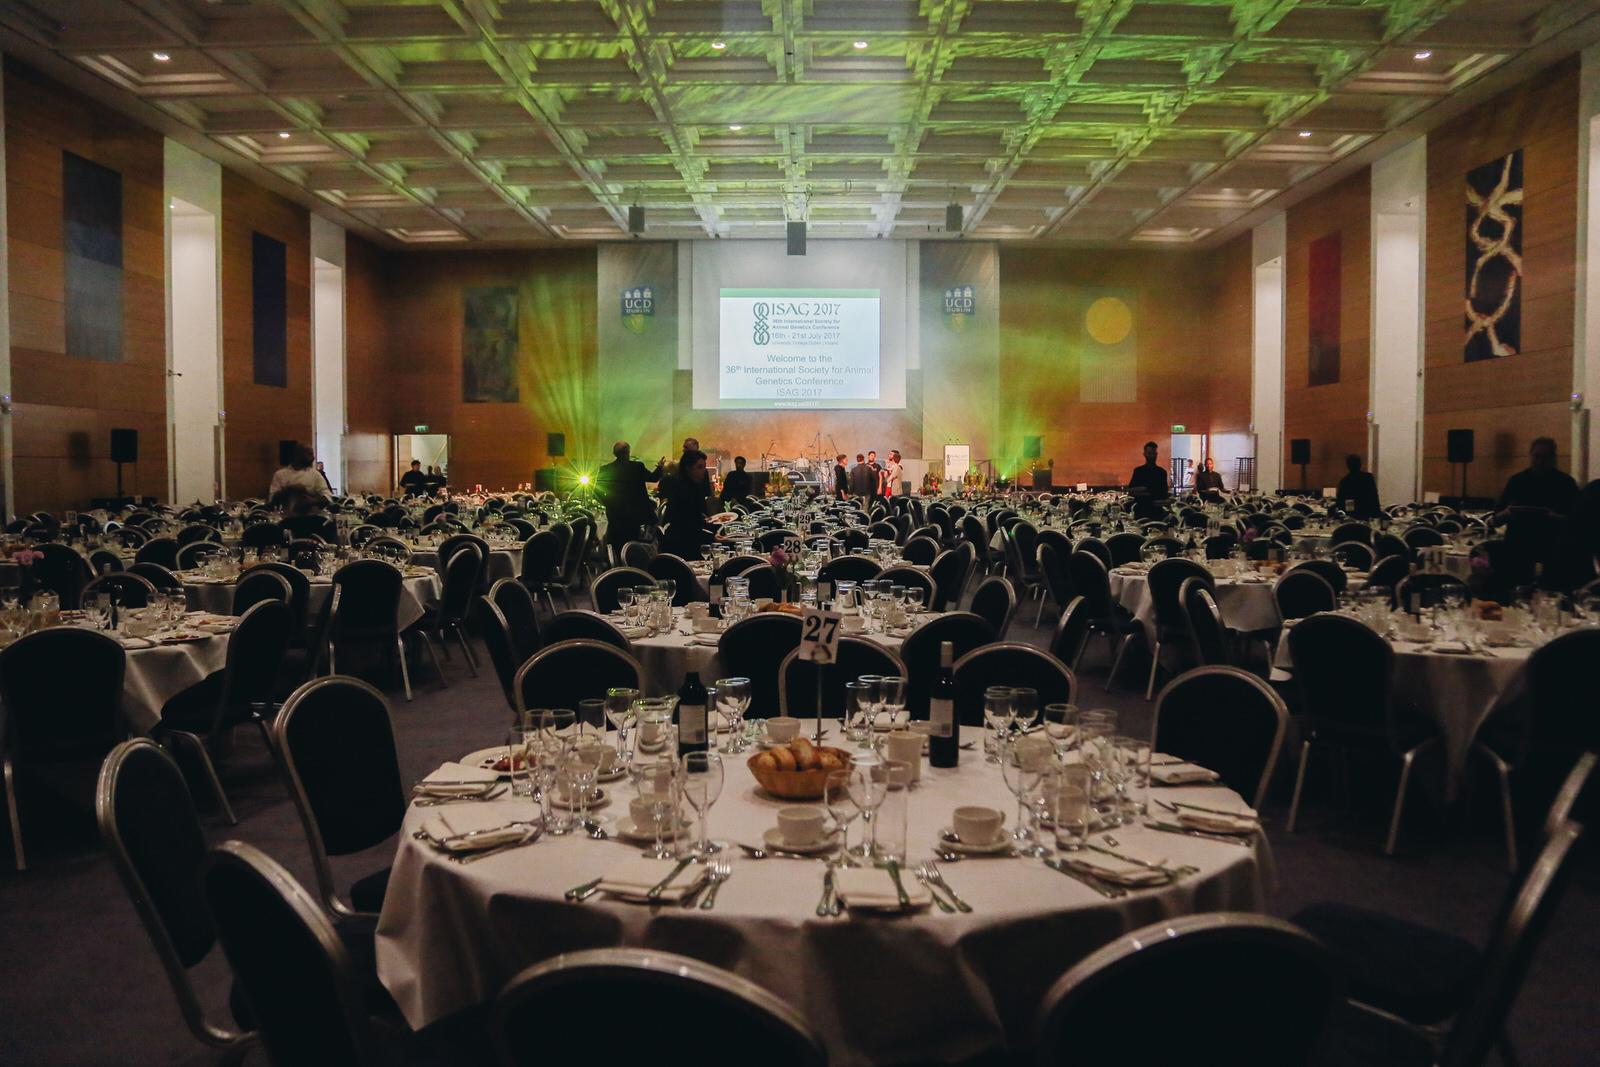 Corporate-conference-photographer-dublin-001.jpg